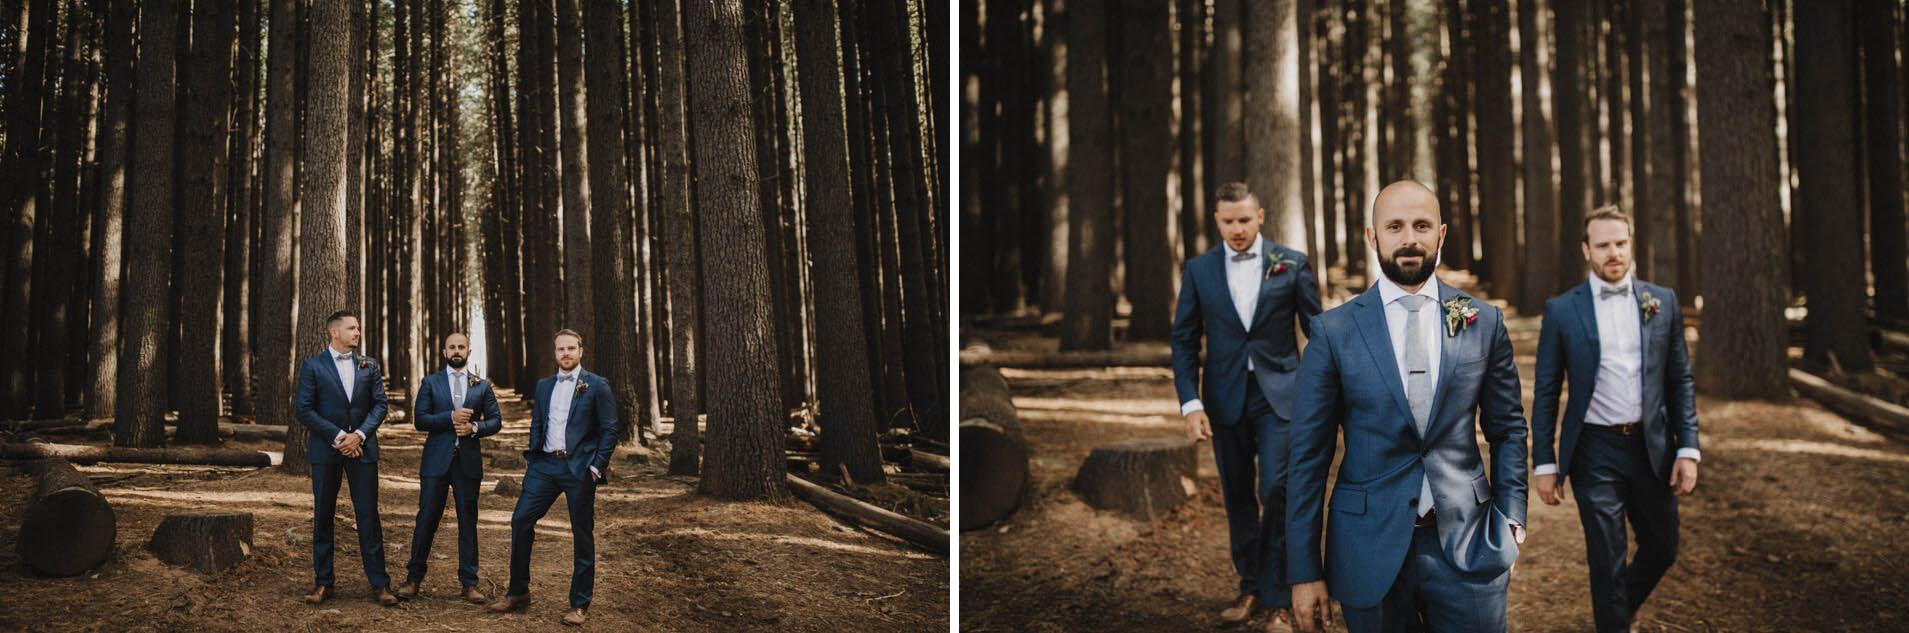 suger-pine-walk-wedding (Corinna & Dylan)_147(1980)2.jpg